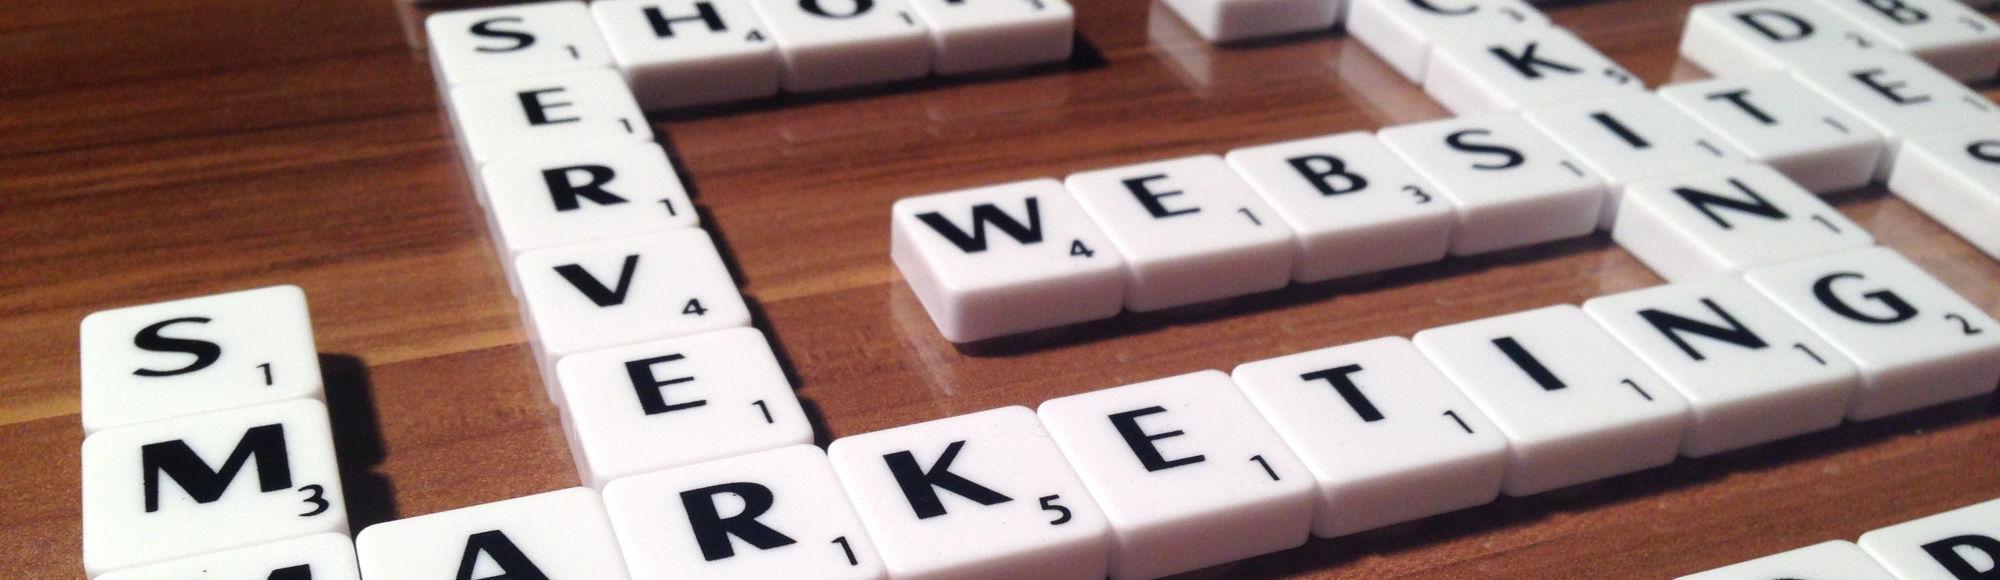 Professional Web Design Services